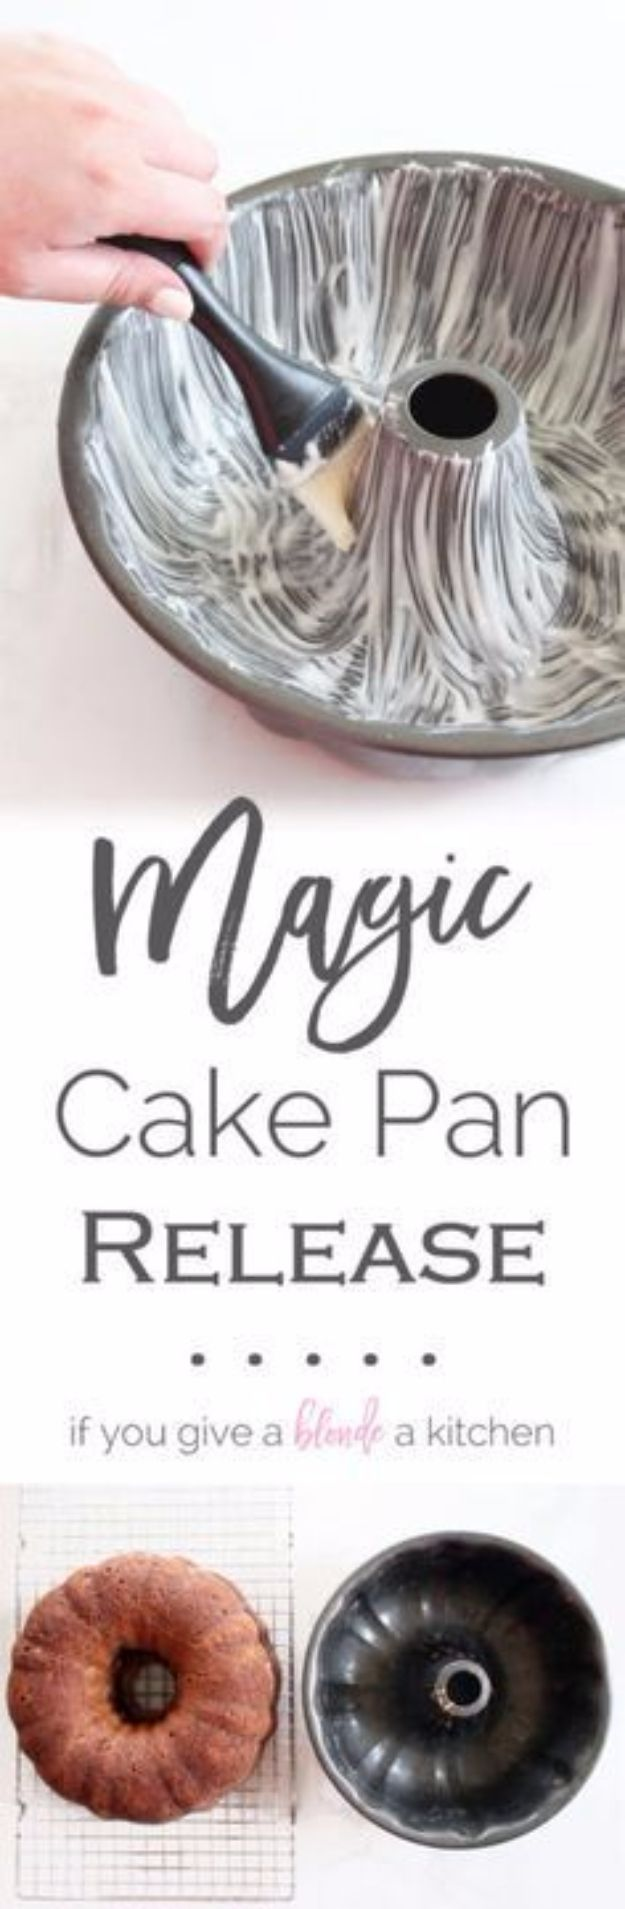 Best Baking Hacks - Magic Cake Pan Release - DIY Cooking Tips and Tricks for Baking Recipes - Quick Ways to Bake Cake, Cupcakes, Desserts and Cookies - Kitchen Lifehacks for Bakers http://diyjoy.com/baking-hacks